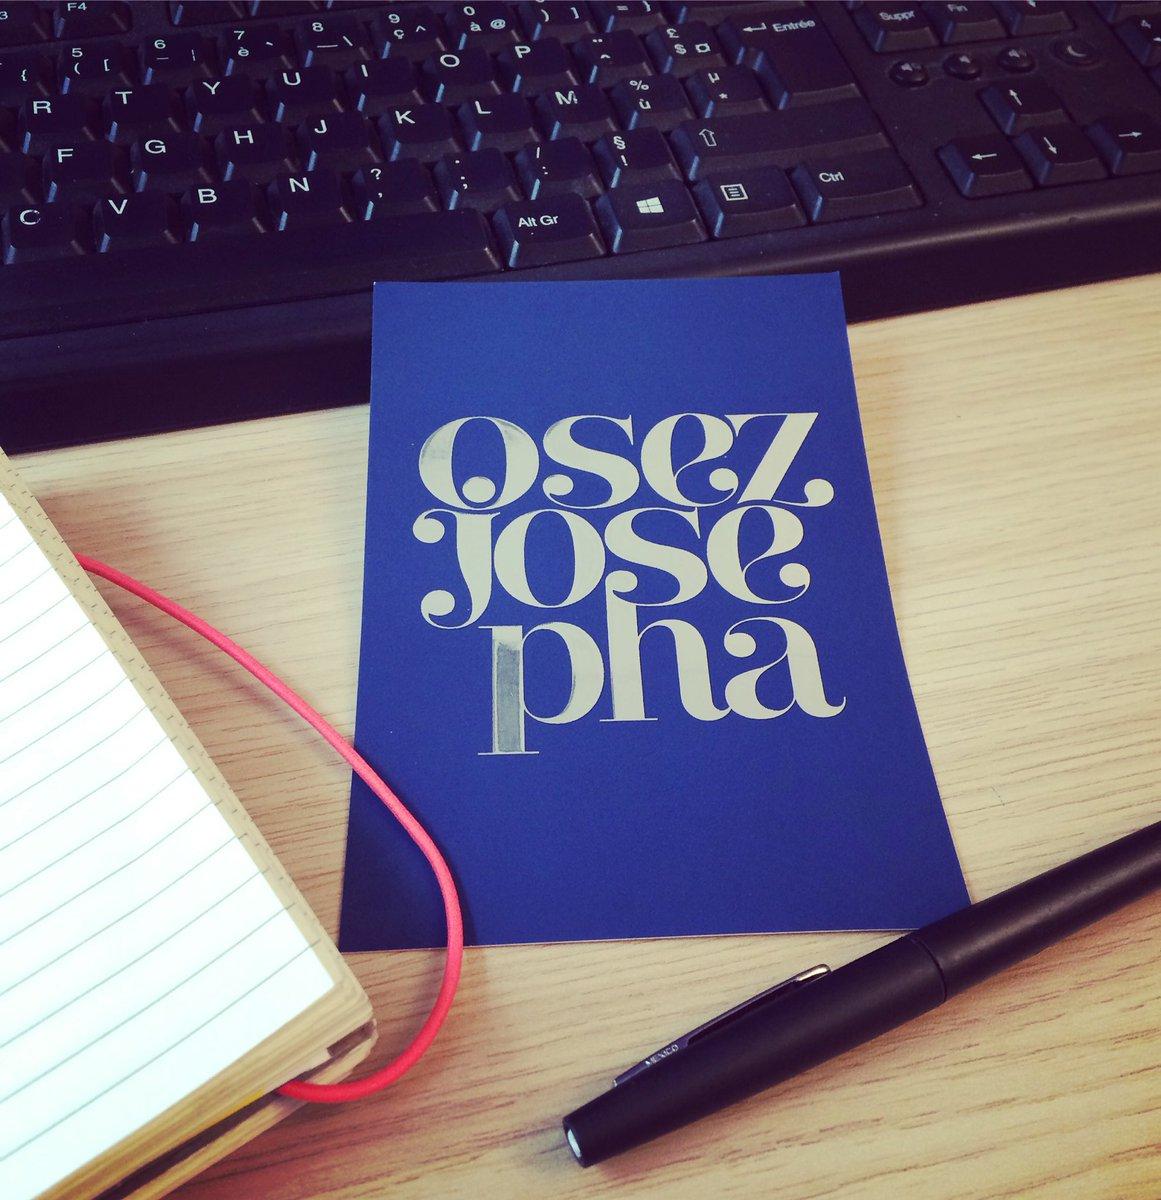 Thanks @Josepha_Com ! #voeux2017 #osezjosepha<br>http://pic.twitter.com/bbWGjSgW6Y